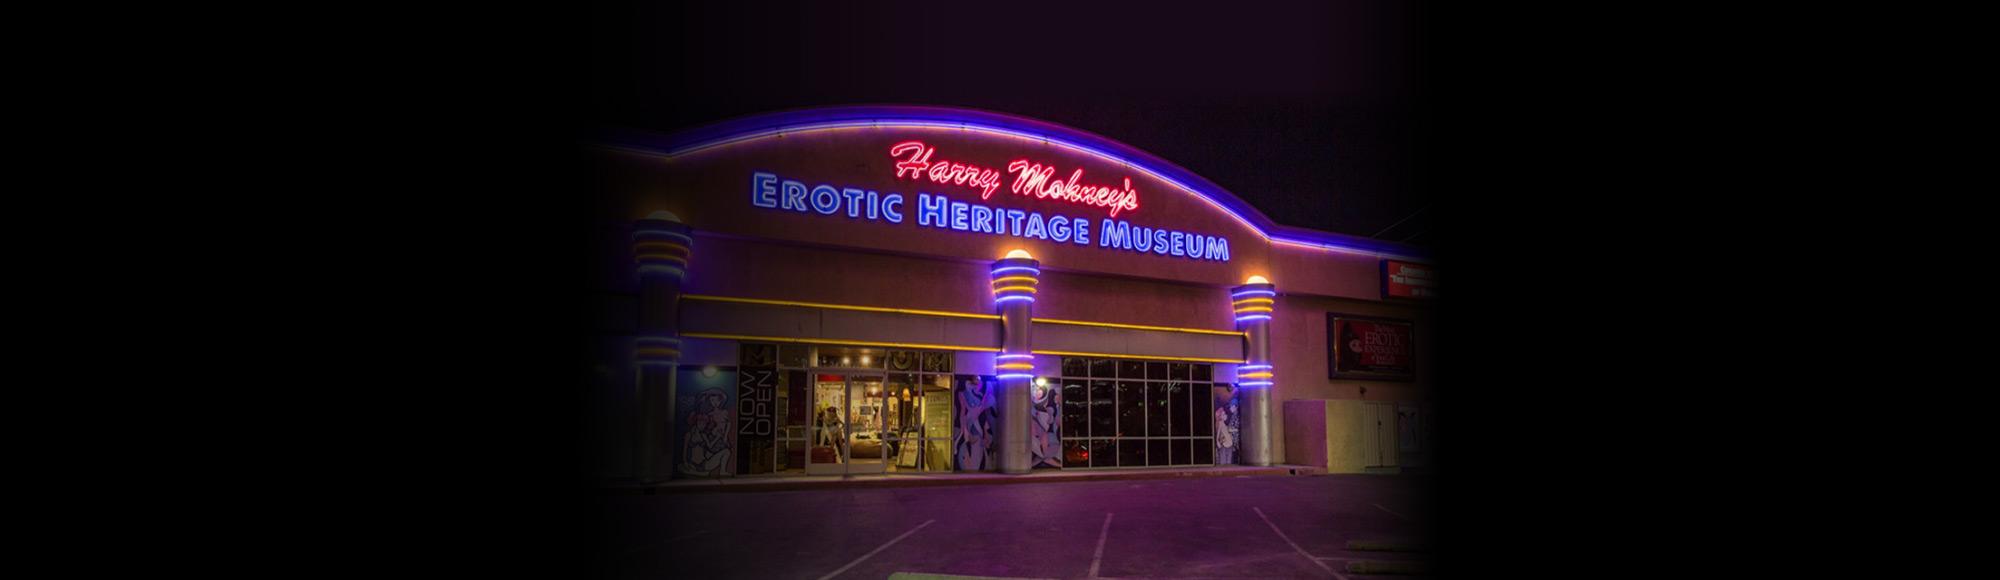 Erotic Heritage Museum attraction